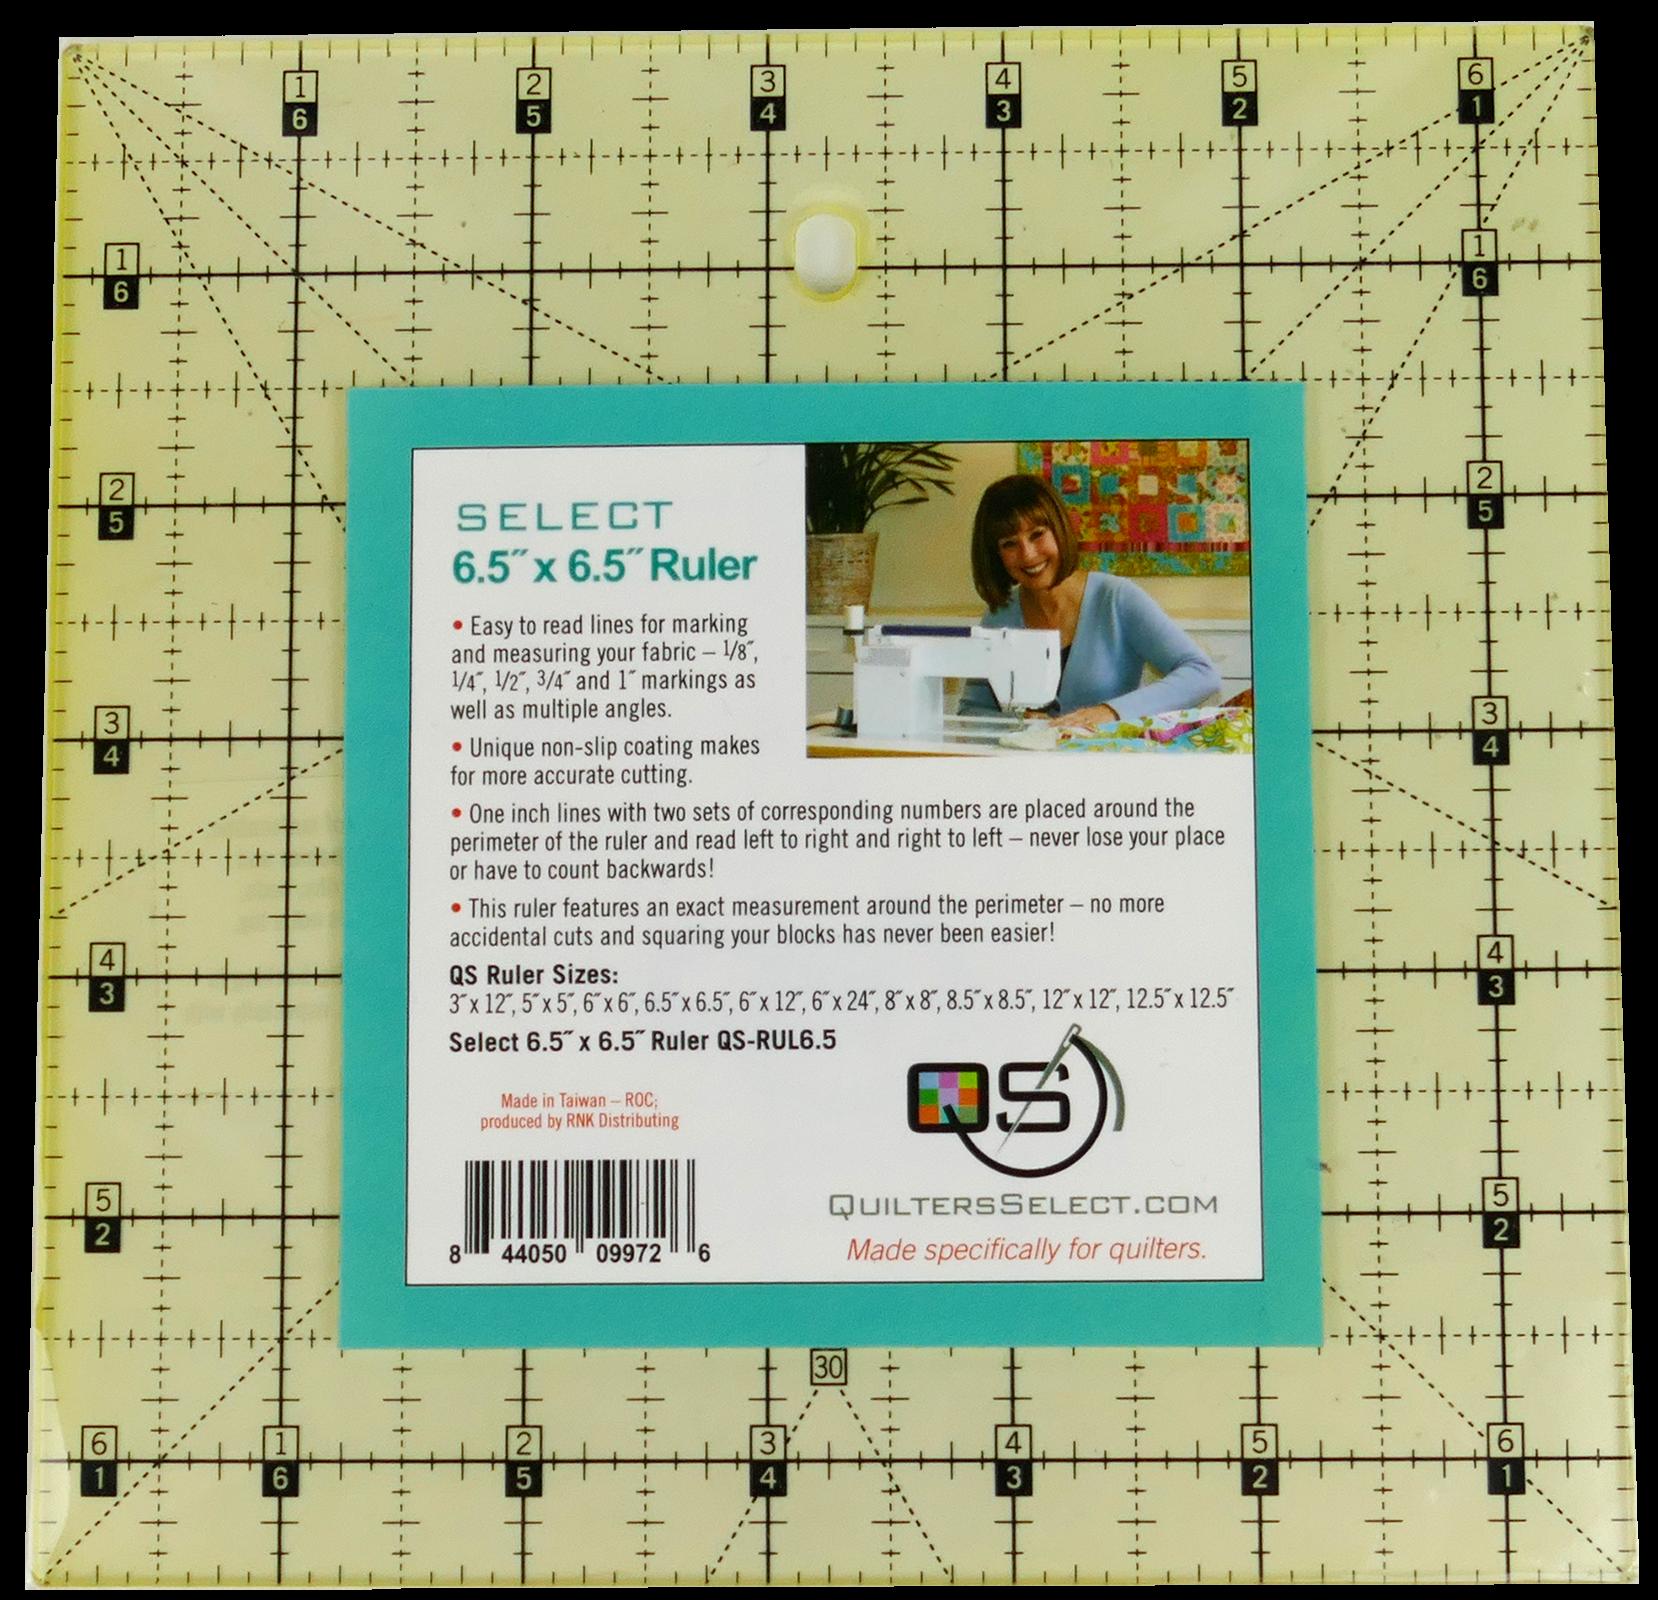 QS Select 6.5 x 6.5 Non-Slip Ruler